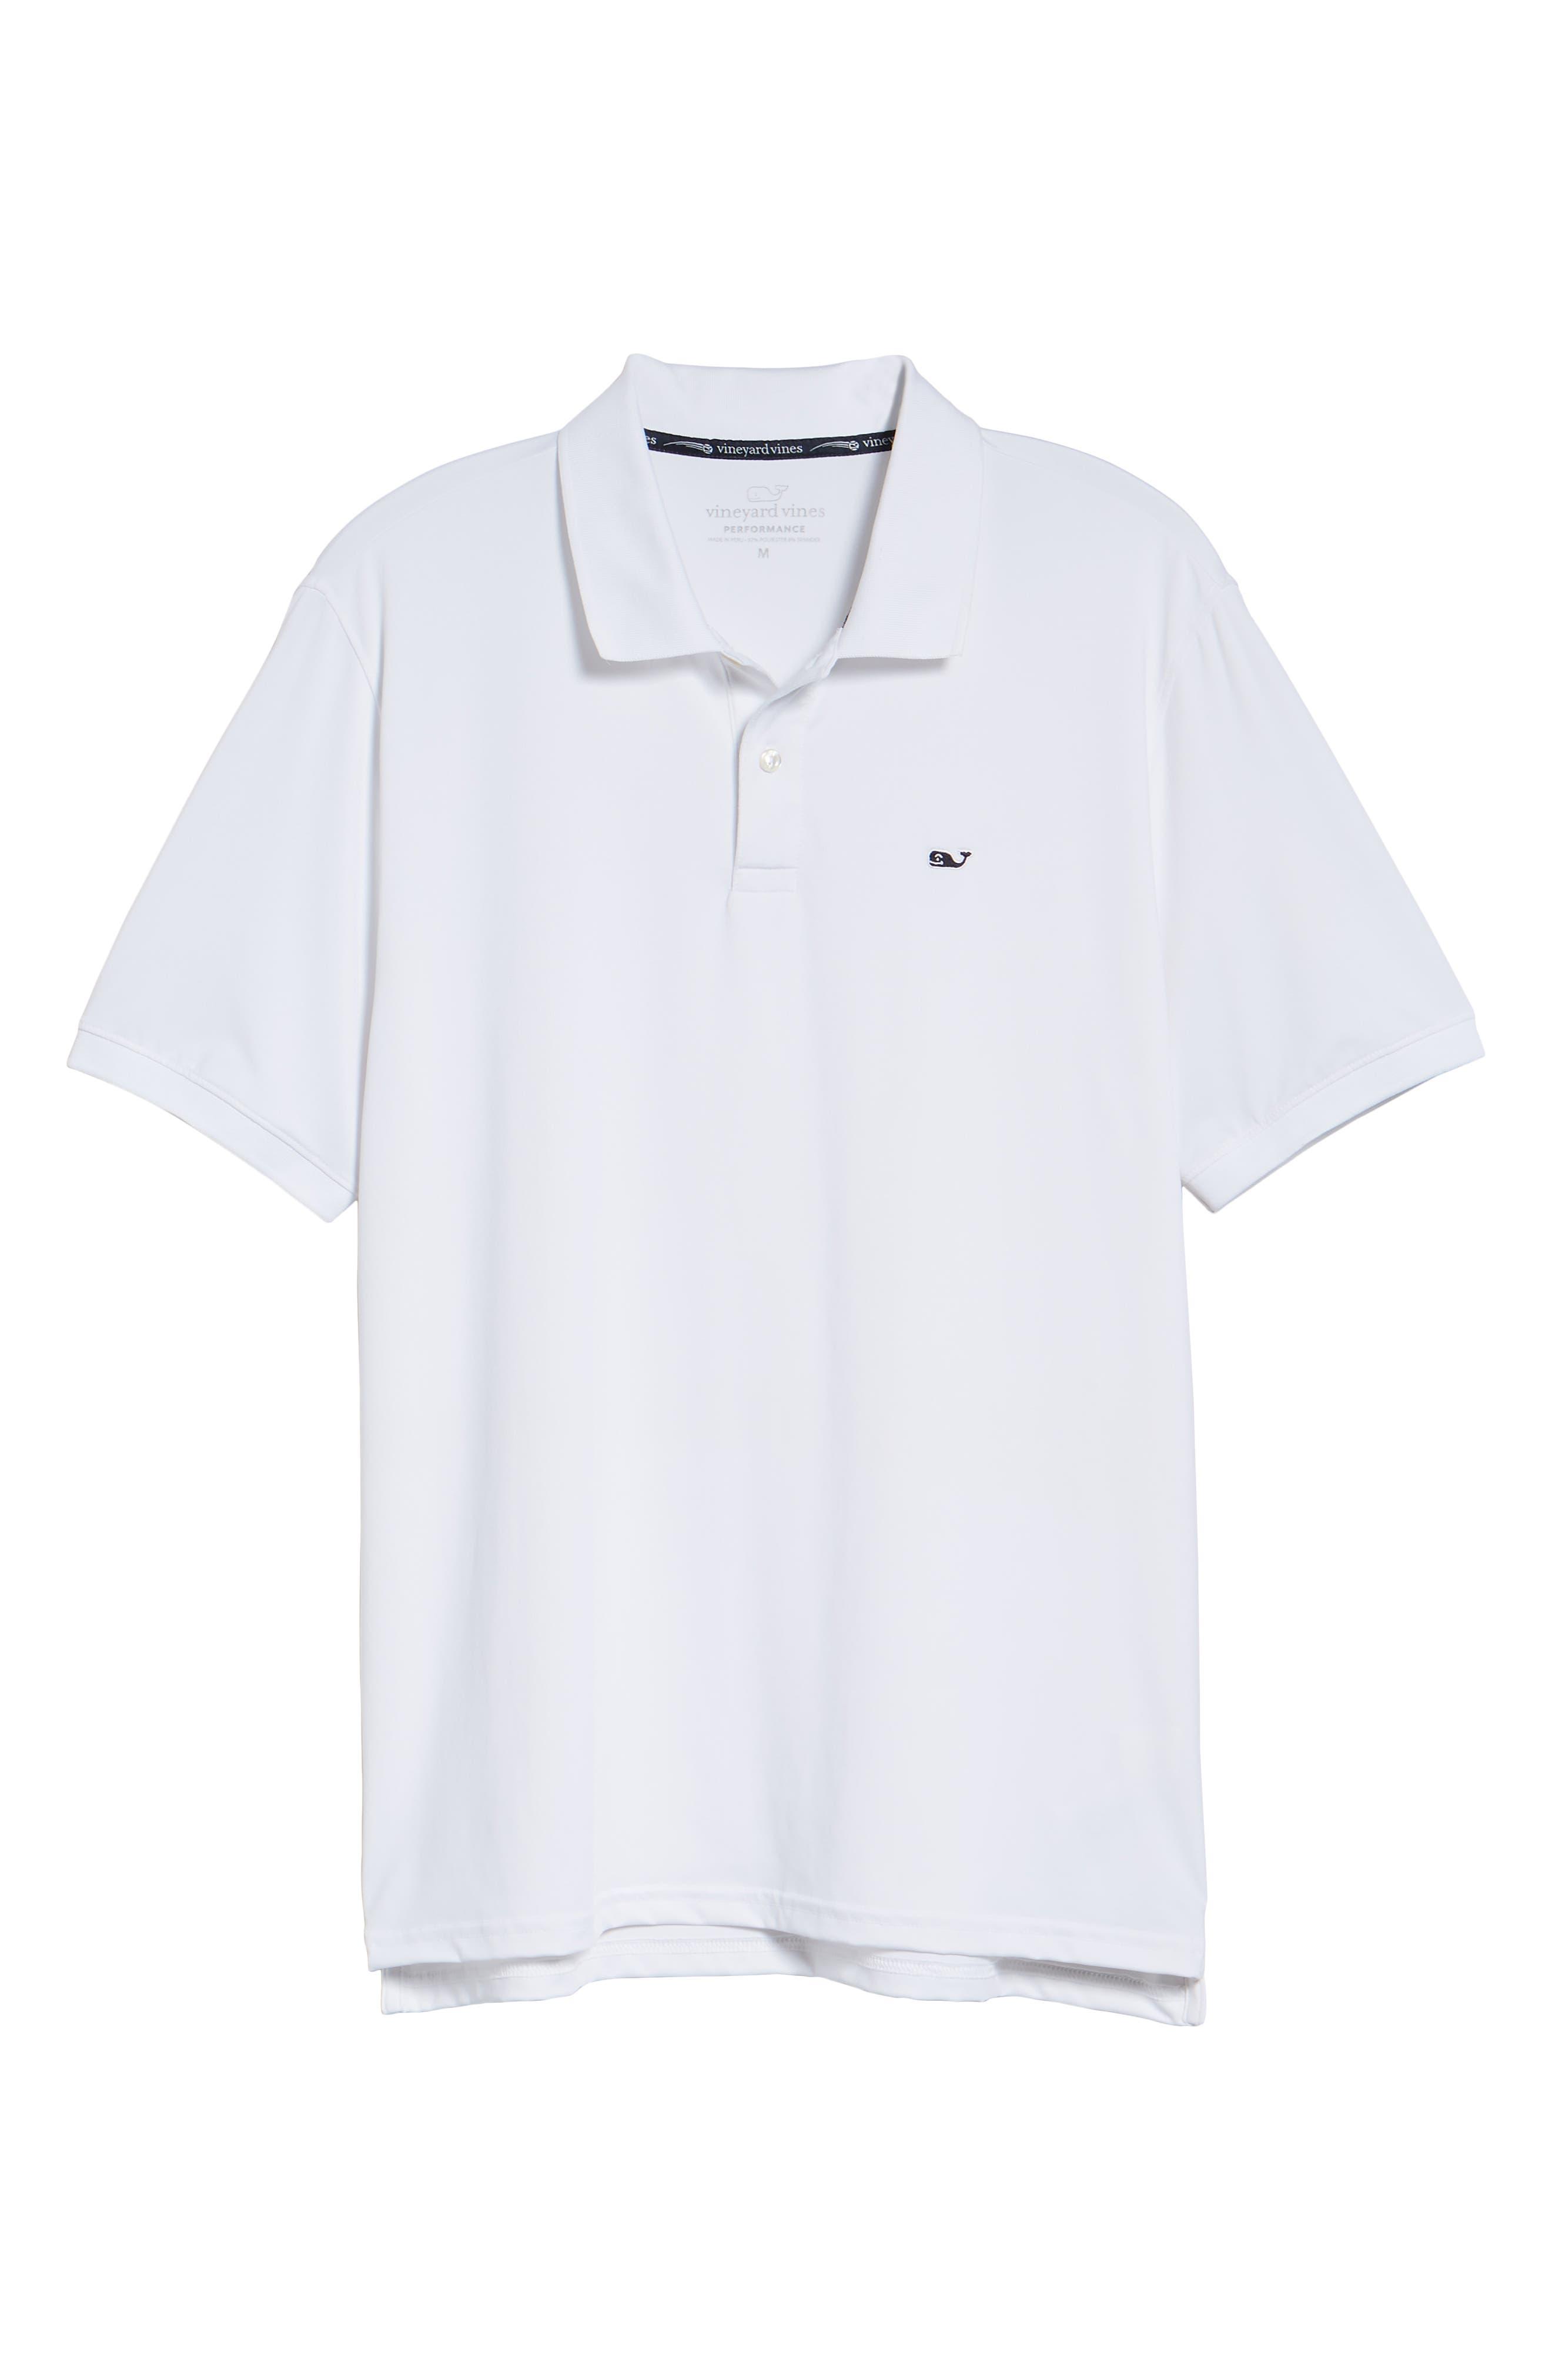 Jersey Polo,                             Alternate thumbnail 6, color,                             WHITE CAP